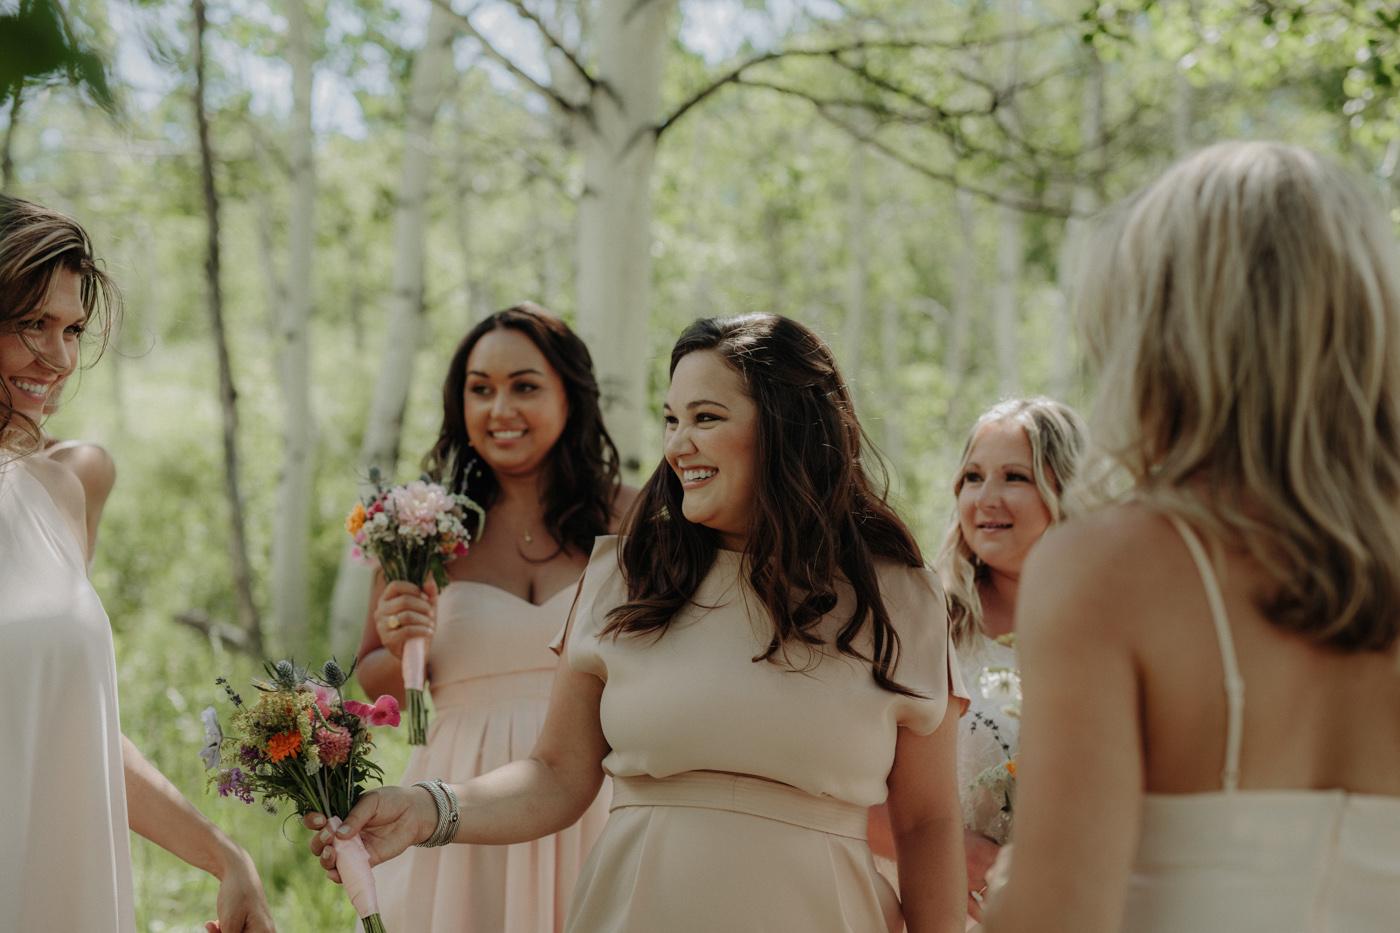 woods-walk-trail-crested-butte-colorado-wedding-63.jpg